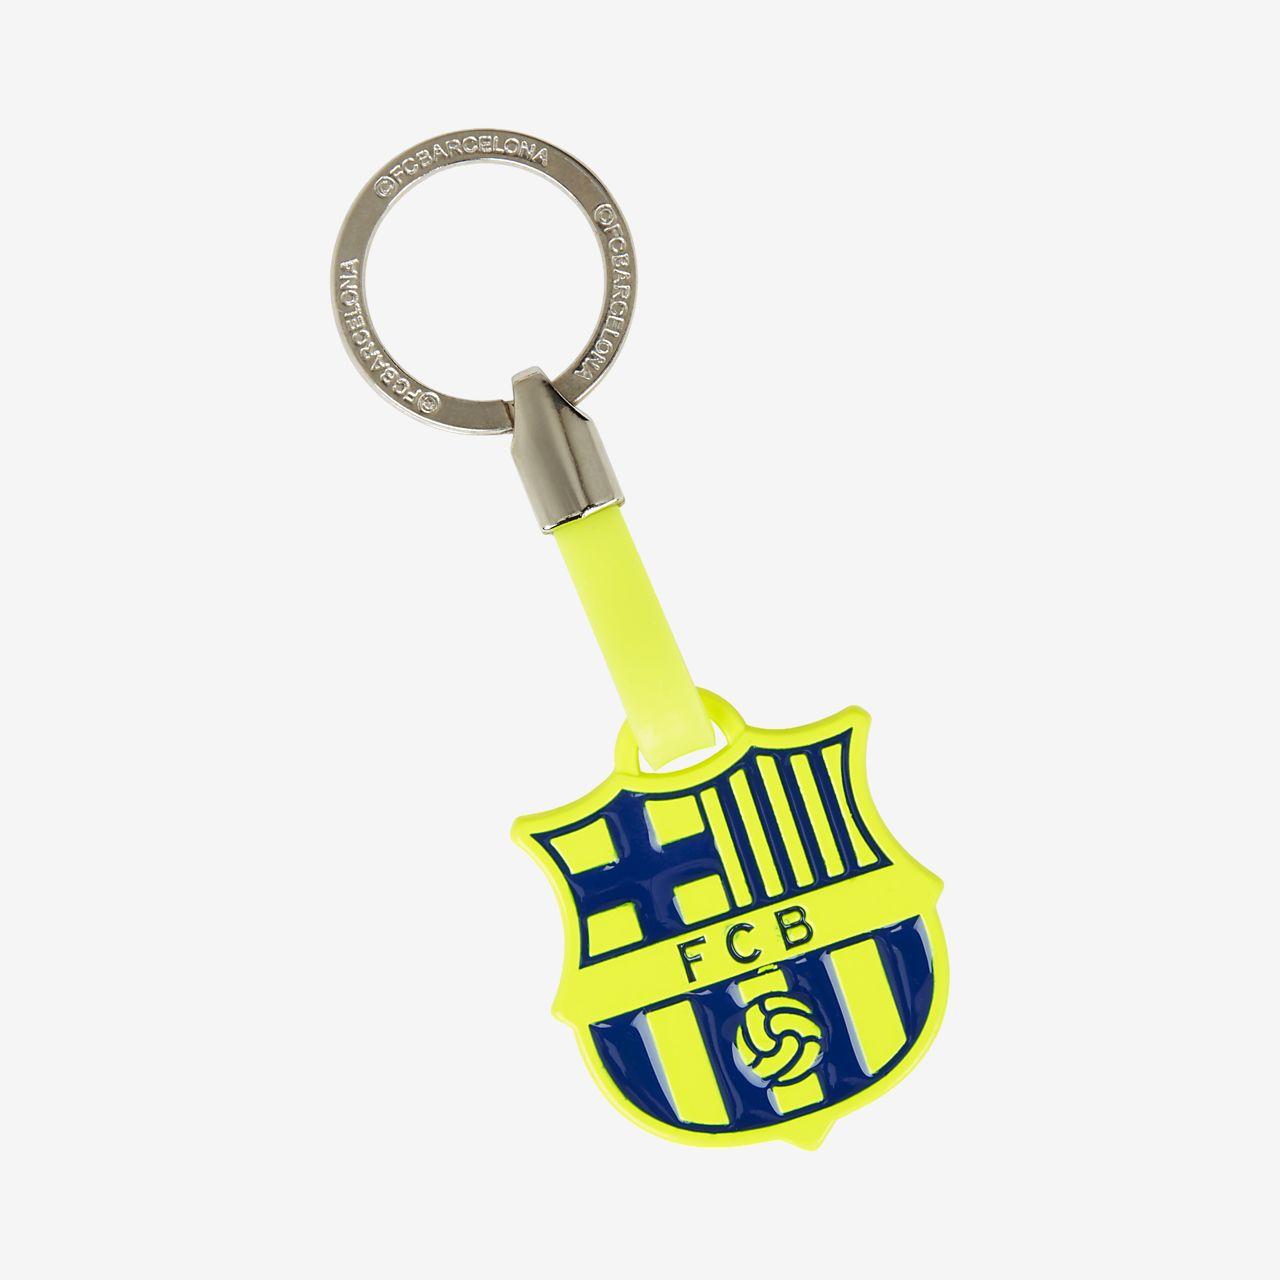 5939b6c6efdf Low Resolution Μπρελόκ FC Barcelona Crest Μπρελόκ FC Barcelona Crest